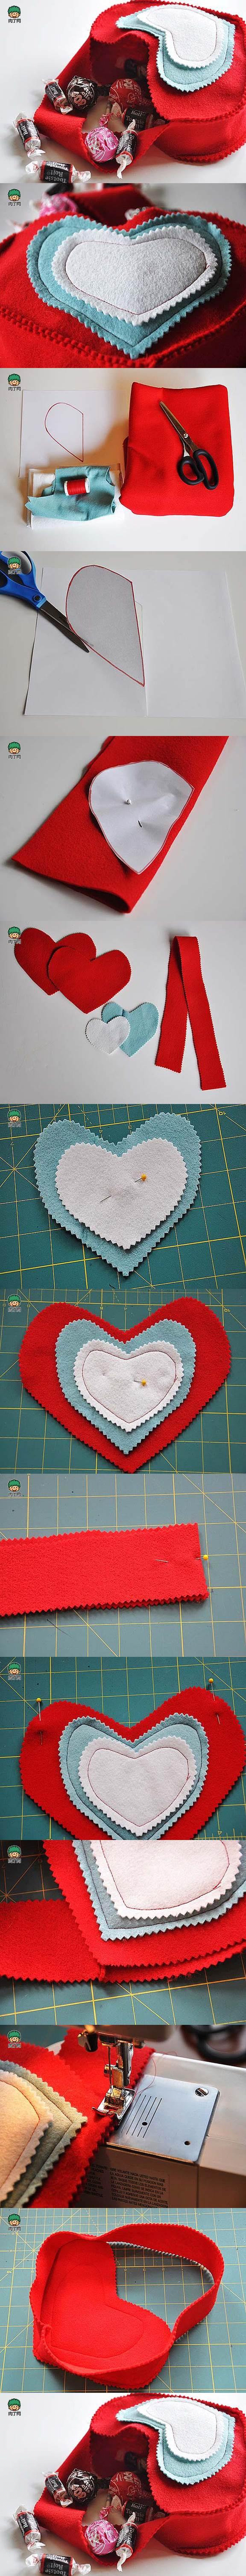 DIY Valentines Day Felted Gift Bag 2